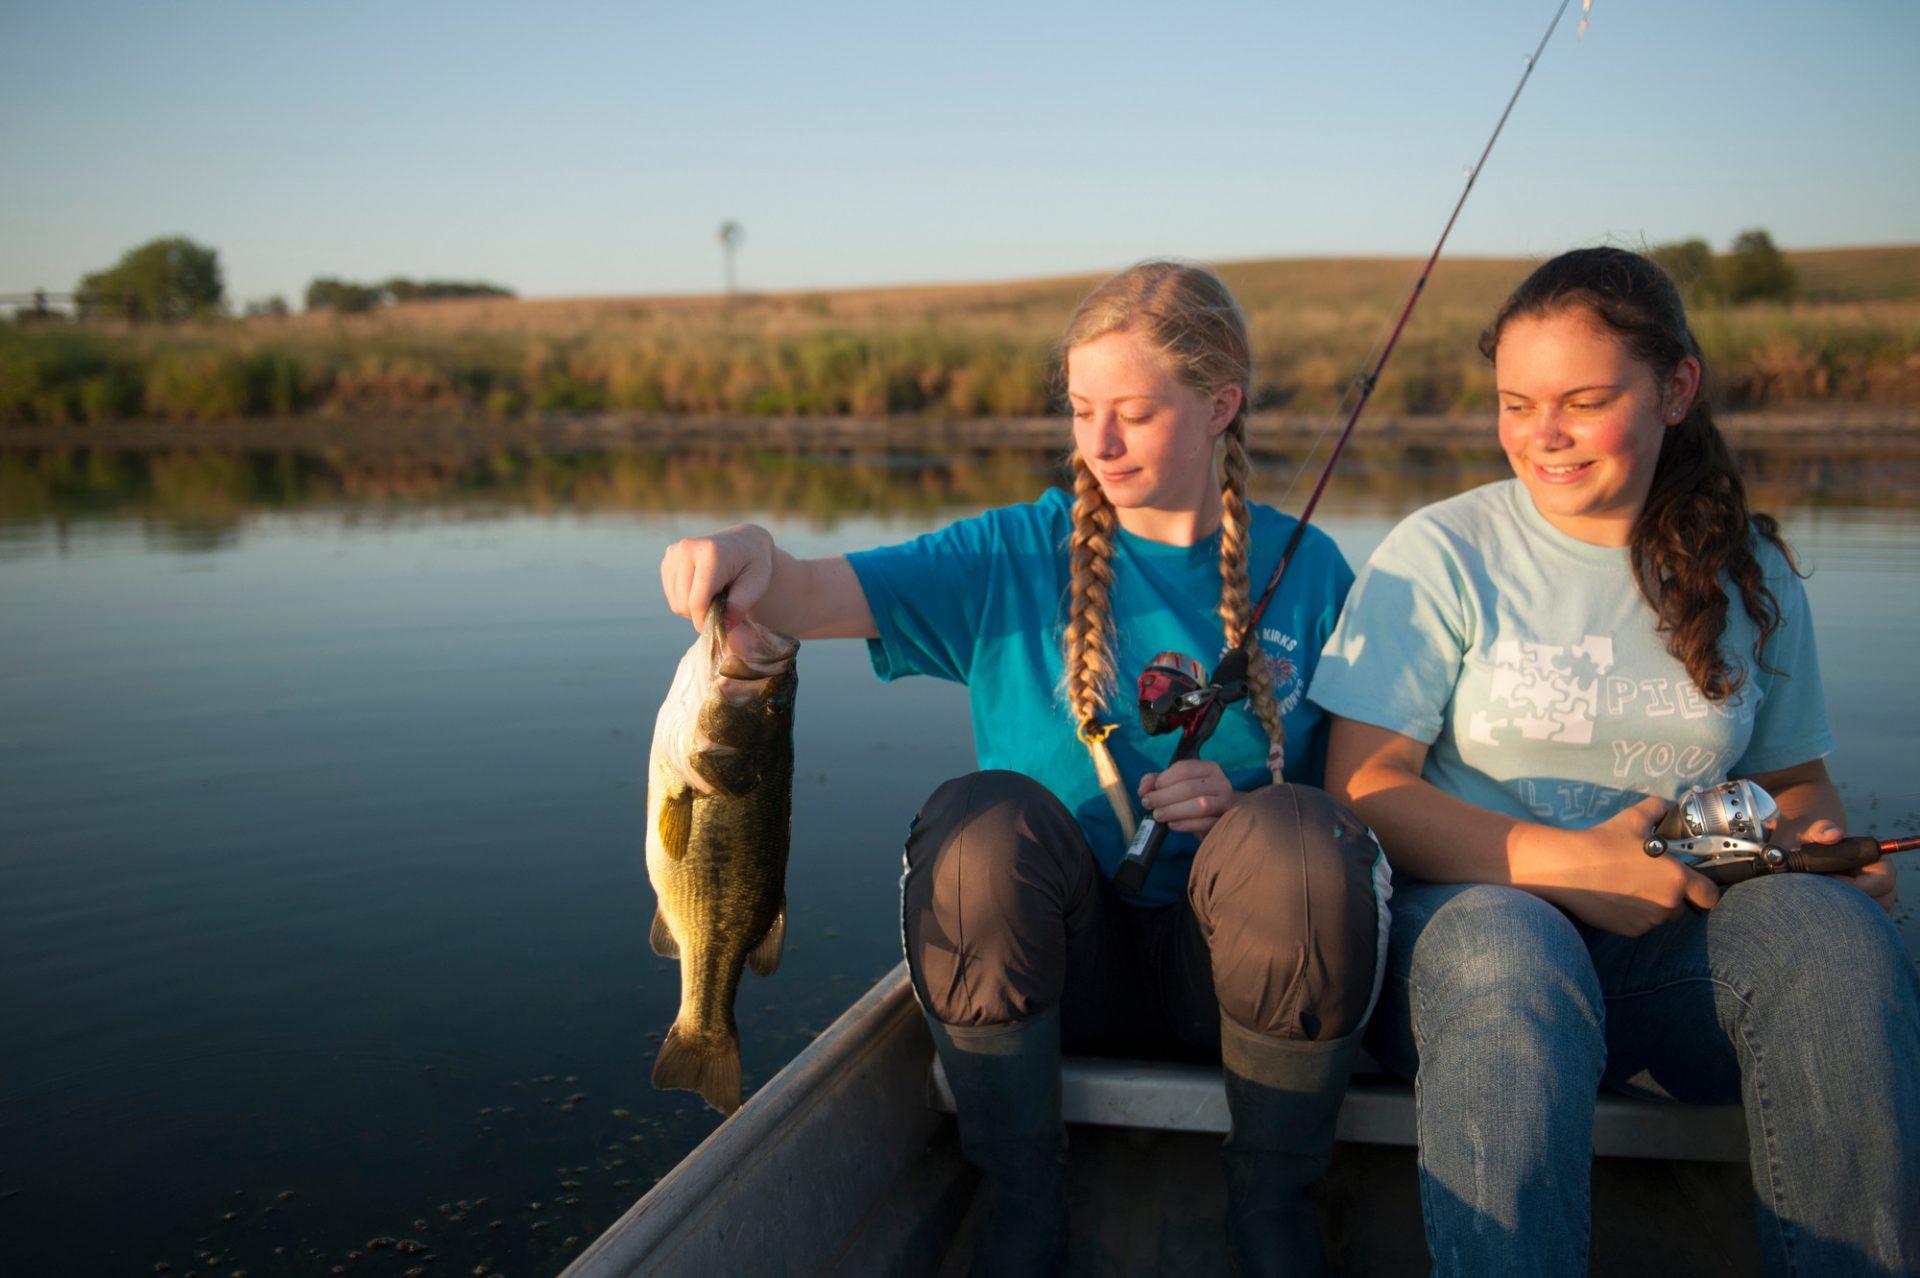 Photo: Cousins fishing on a pond near Valparaiso, NE.